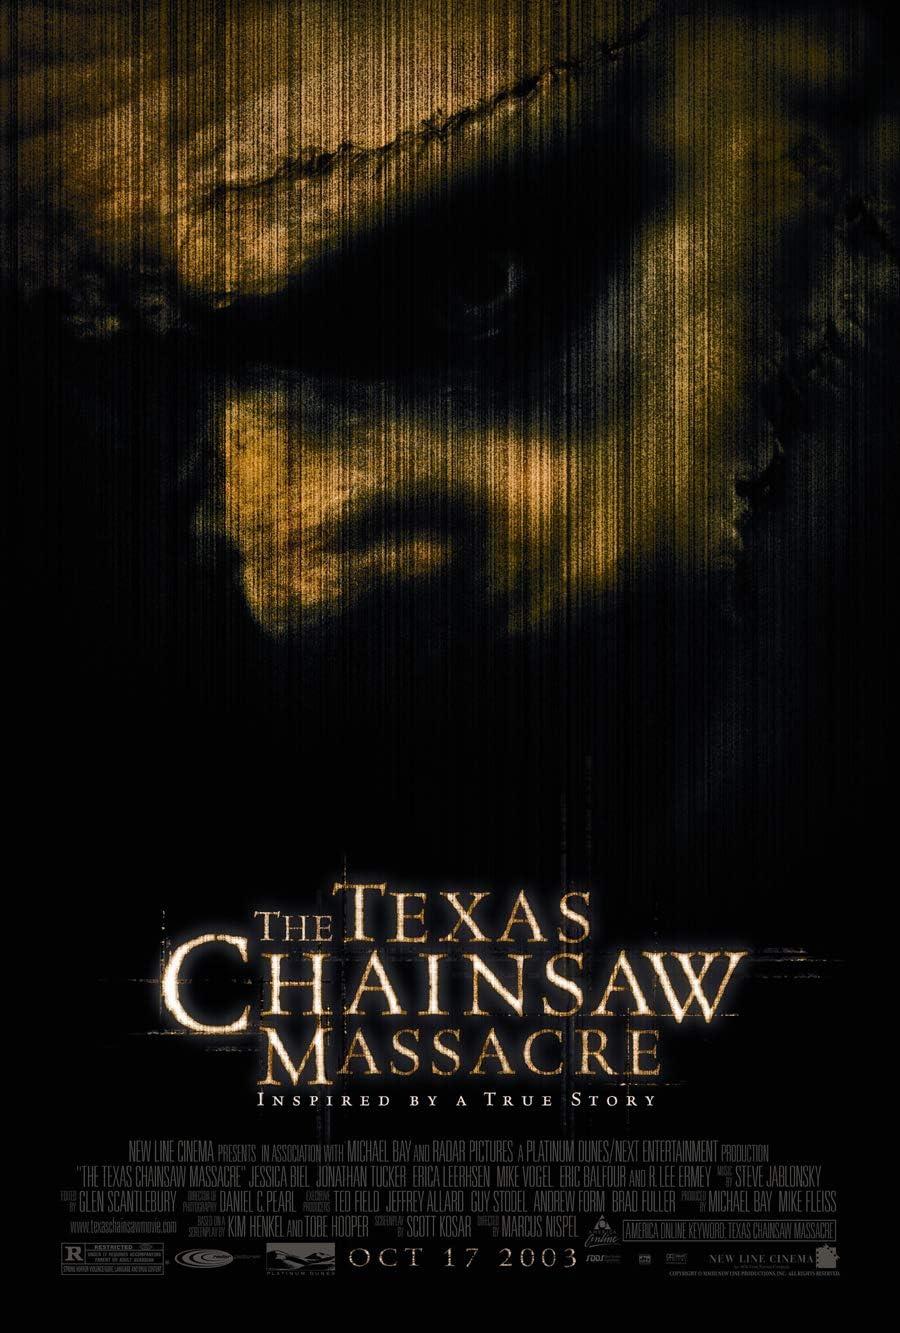 Texas Chainsaw Massacre Movie Poster 1 Sided Original 27x40 Jessica BIEL